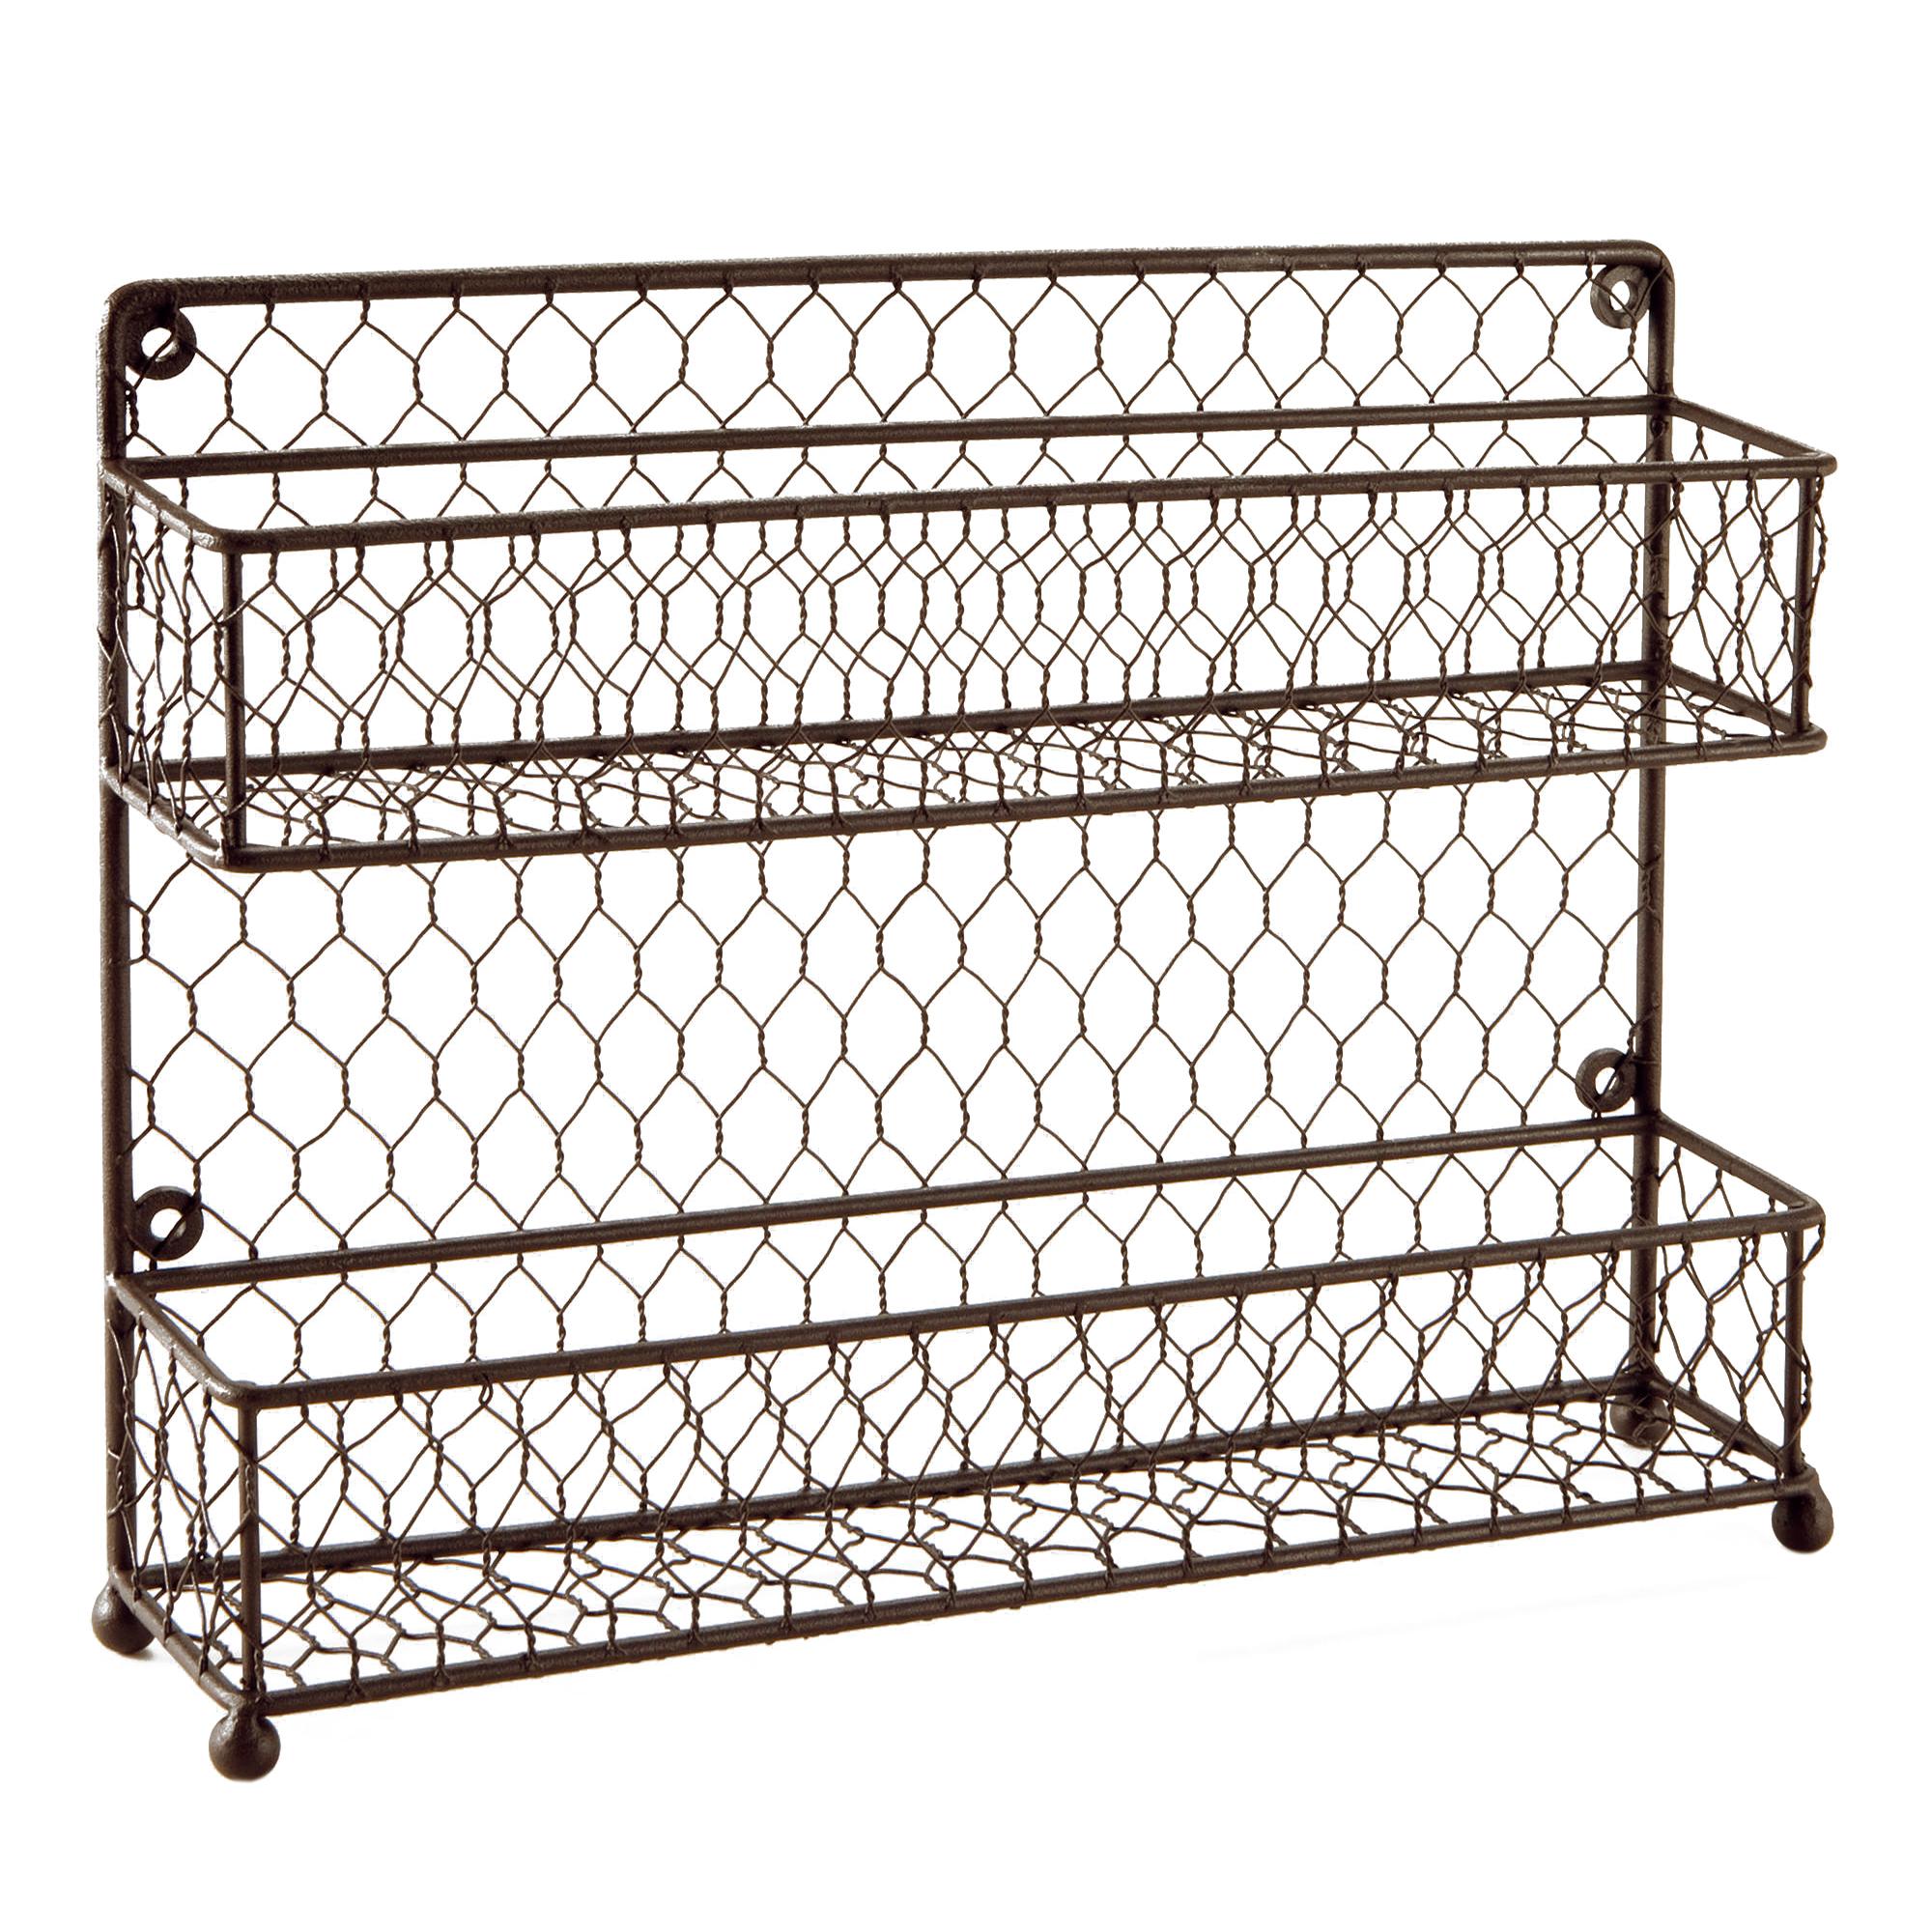 Rustic Brown Dual Tier Wire Spice Rack Jars Storage Organizer | eBay